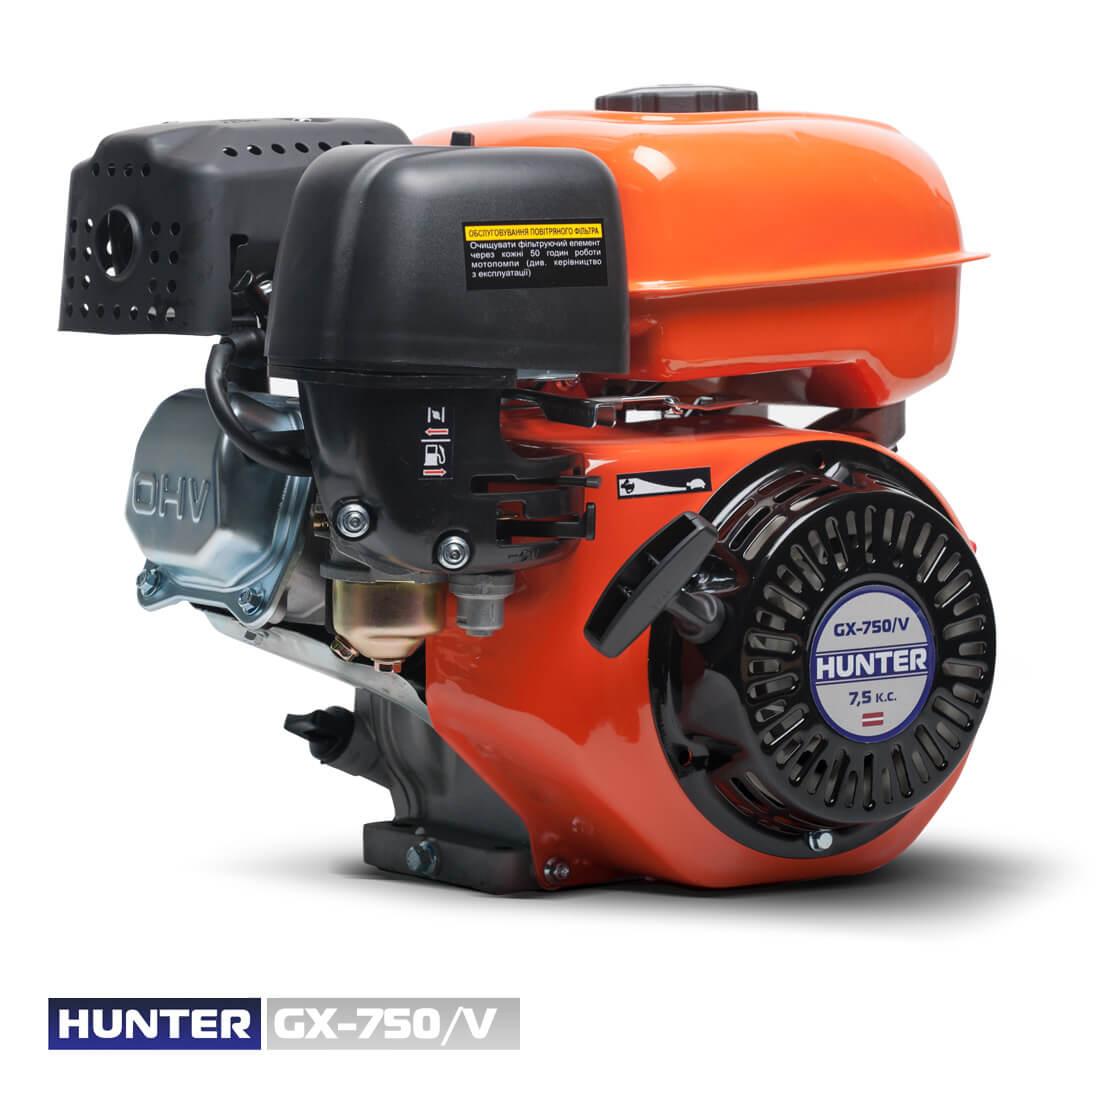 Фото GX-750/V цена 5000грн №3 — Hunter